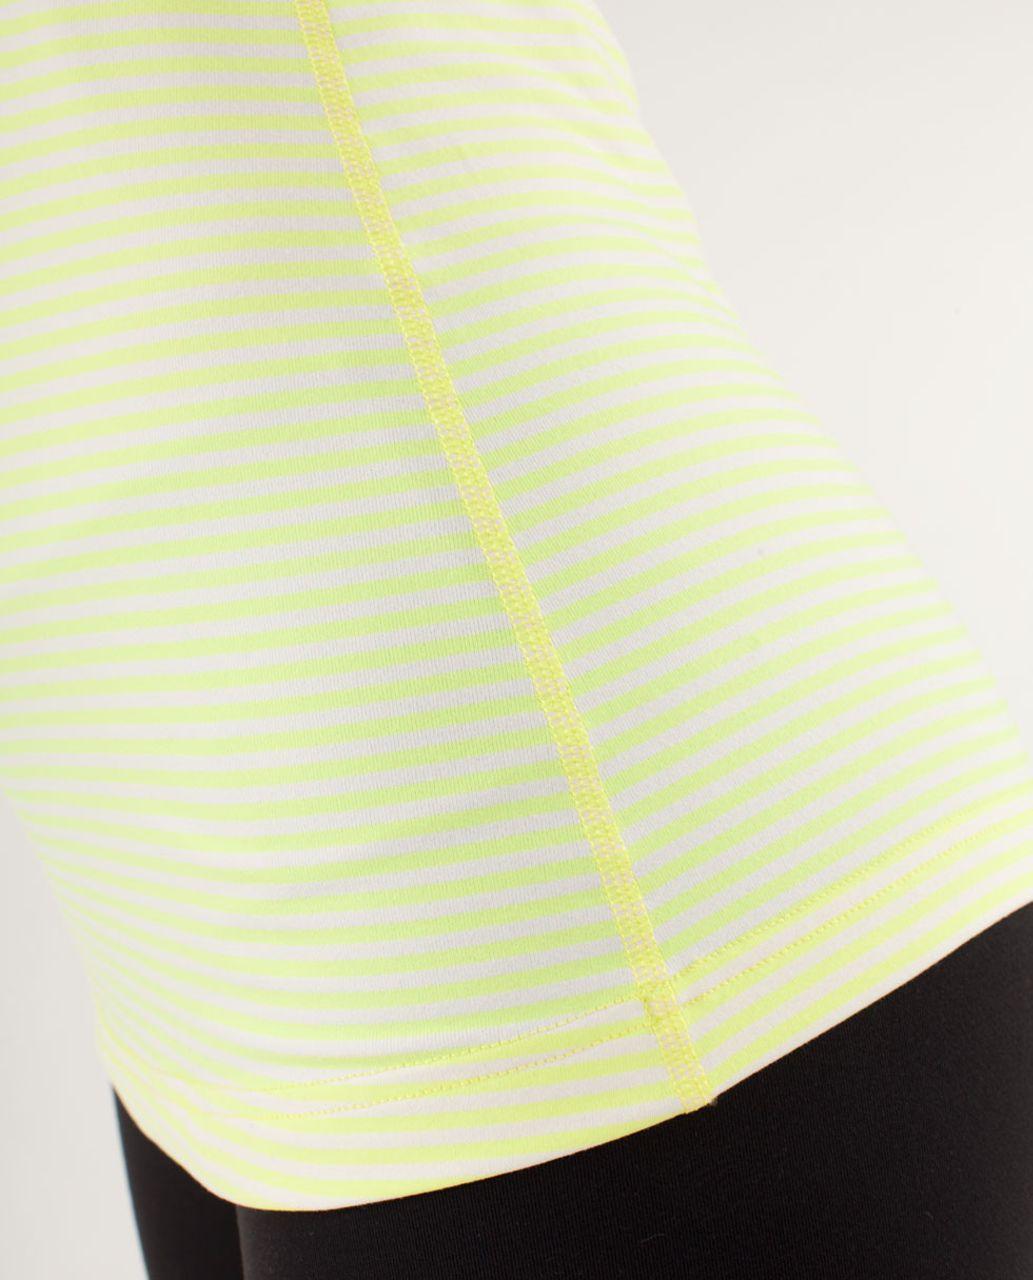 Lululemon Cool Racerback - Slope Stripe Polar Cream Clarity Yellow